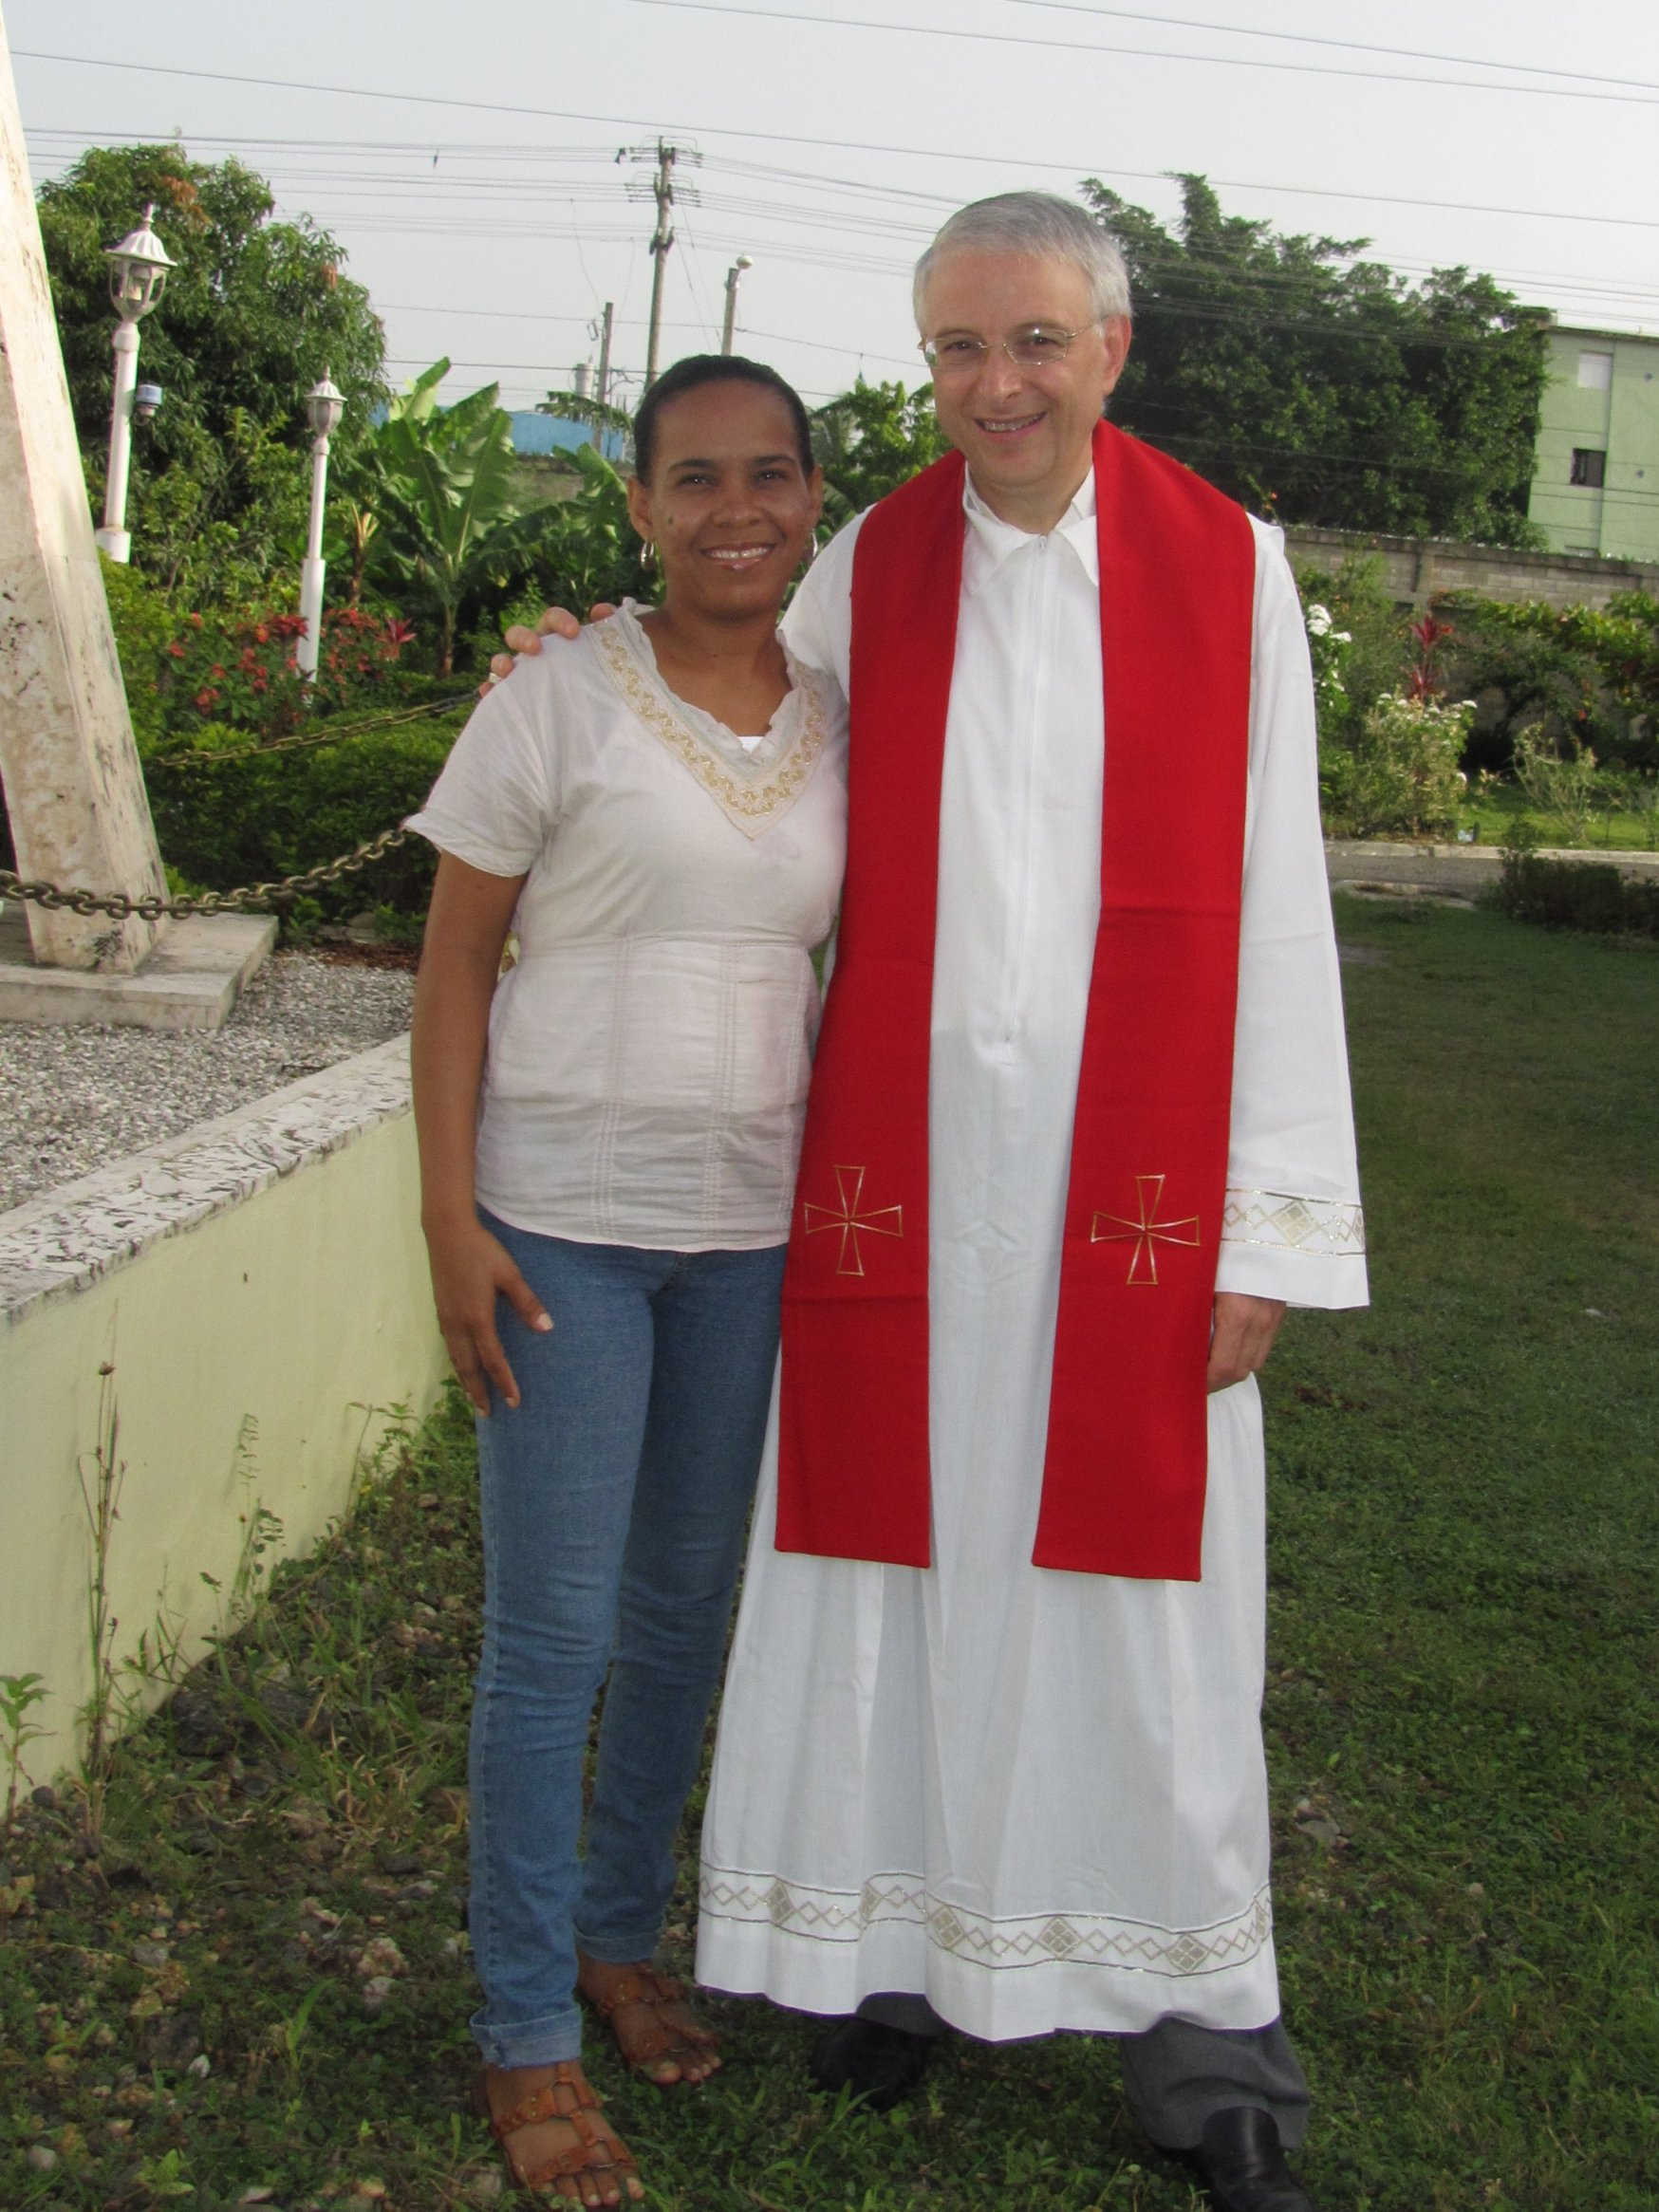 guaricano_con_tumba_lorenzo_2012-06-28-07-57-36